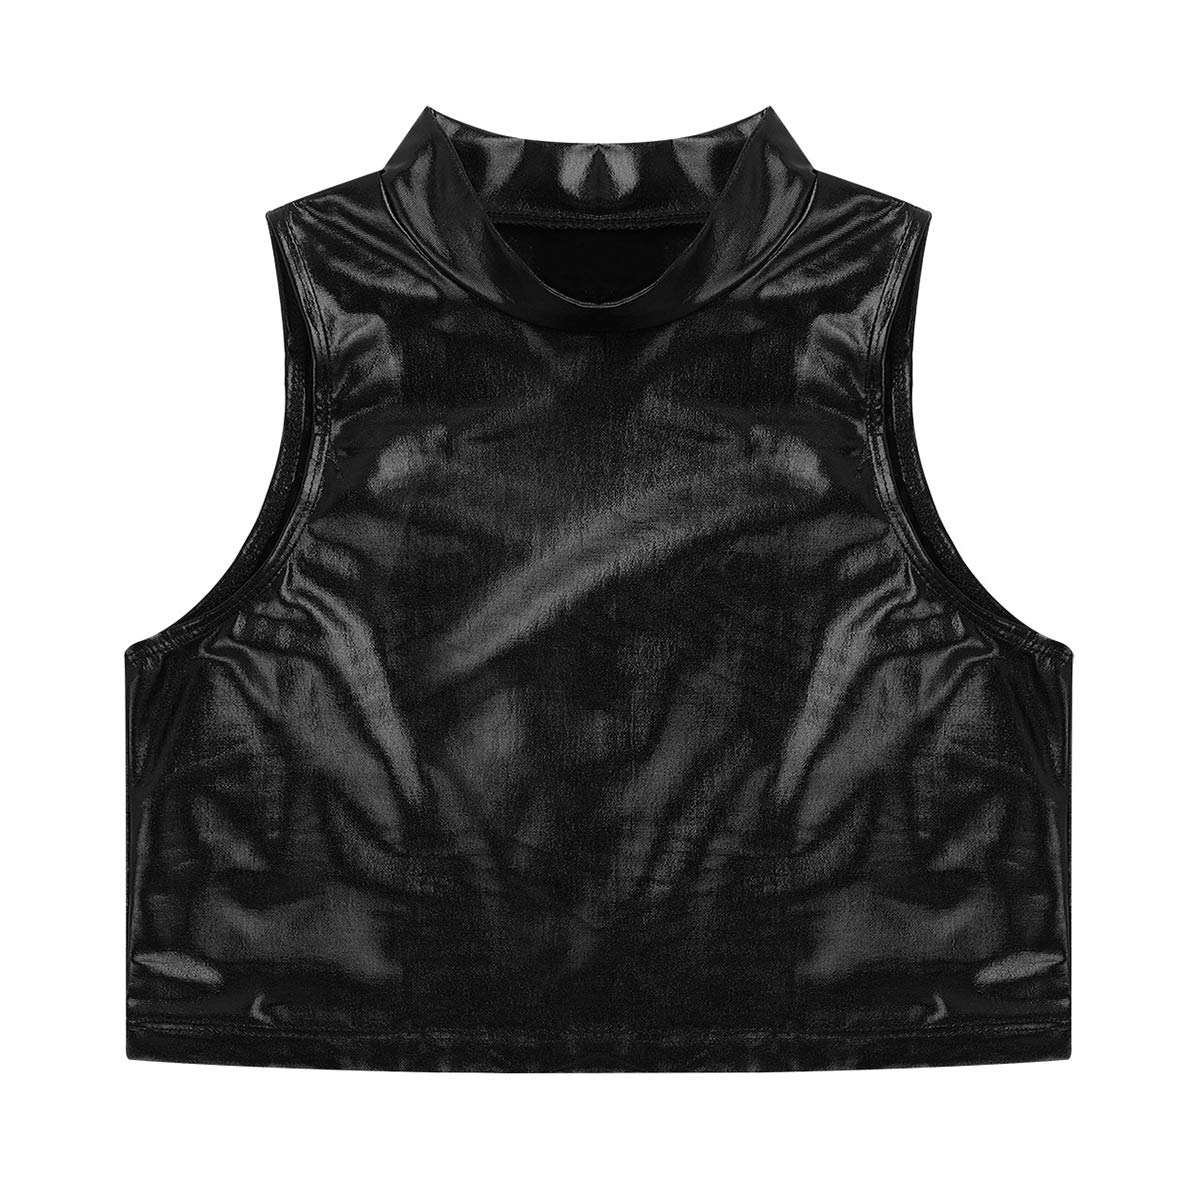 FEESHOW Big Girls Sleeveless Metallic Tank Top Turtle Mock-Neck Crop Tops Tee Shirt for Sports Dance wear